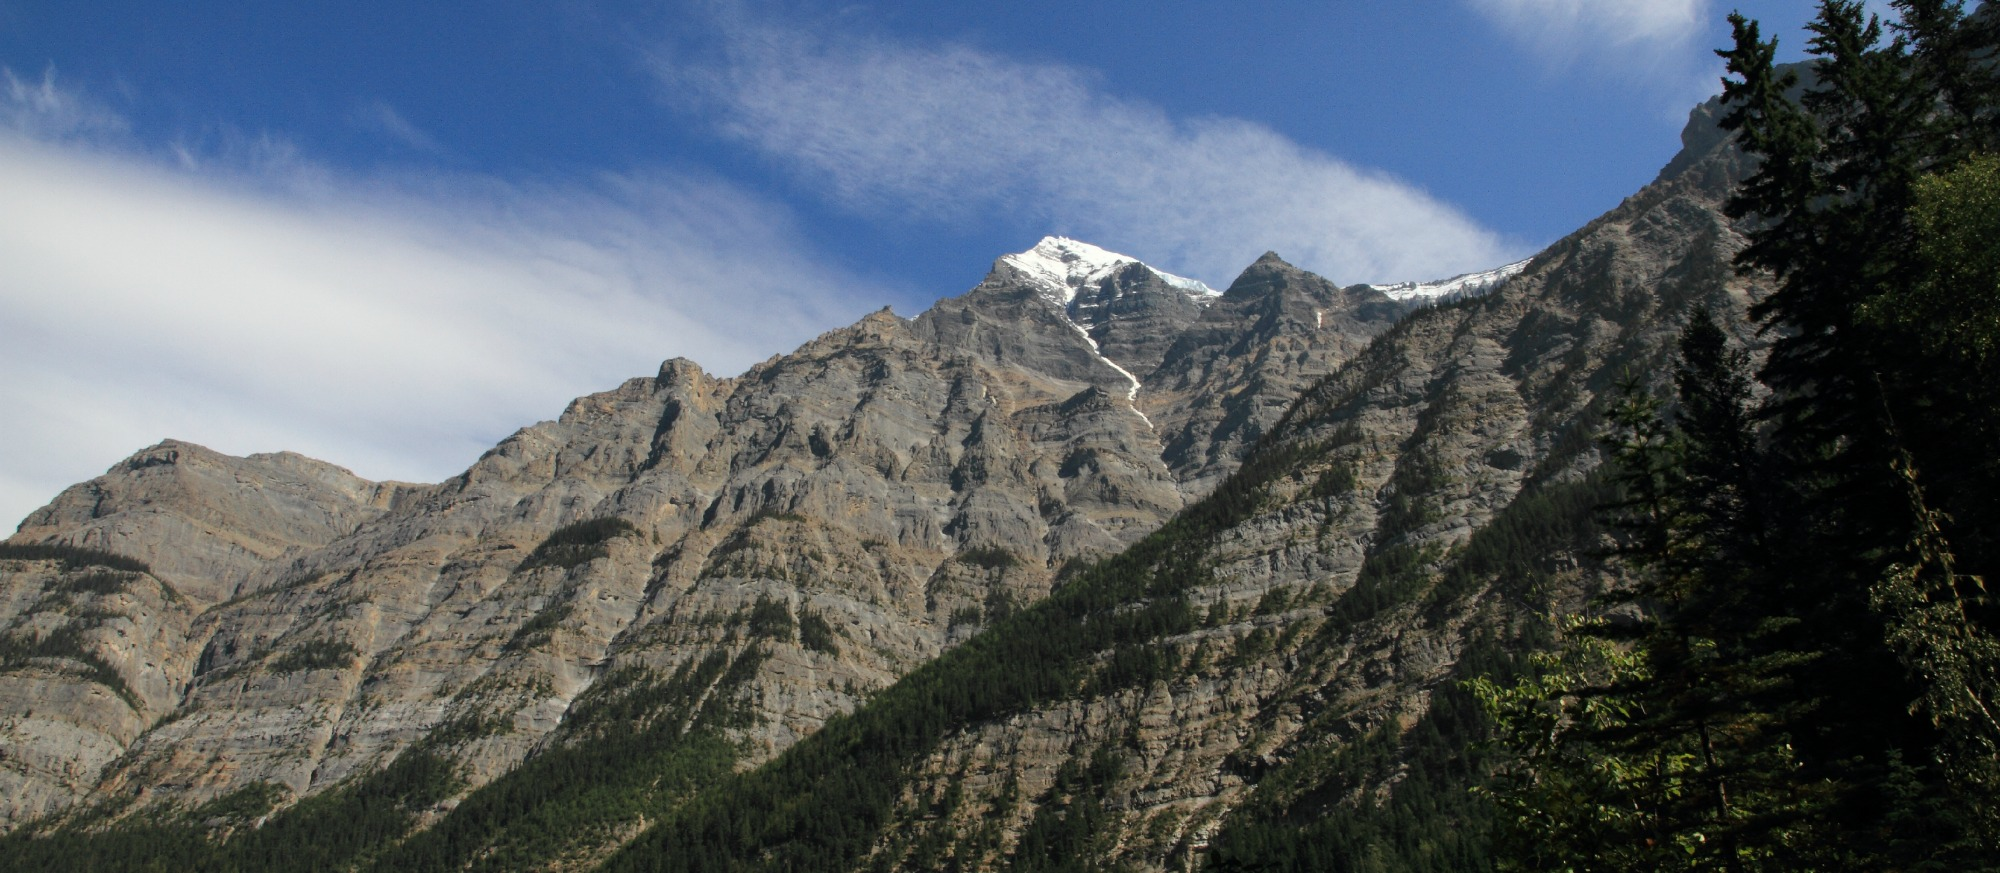 Mount Robson geologic layers